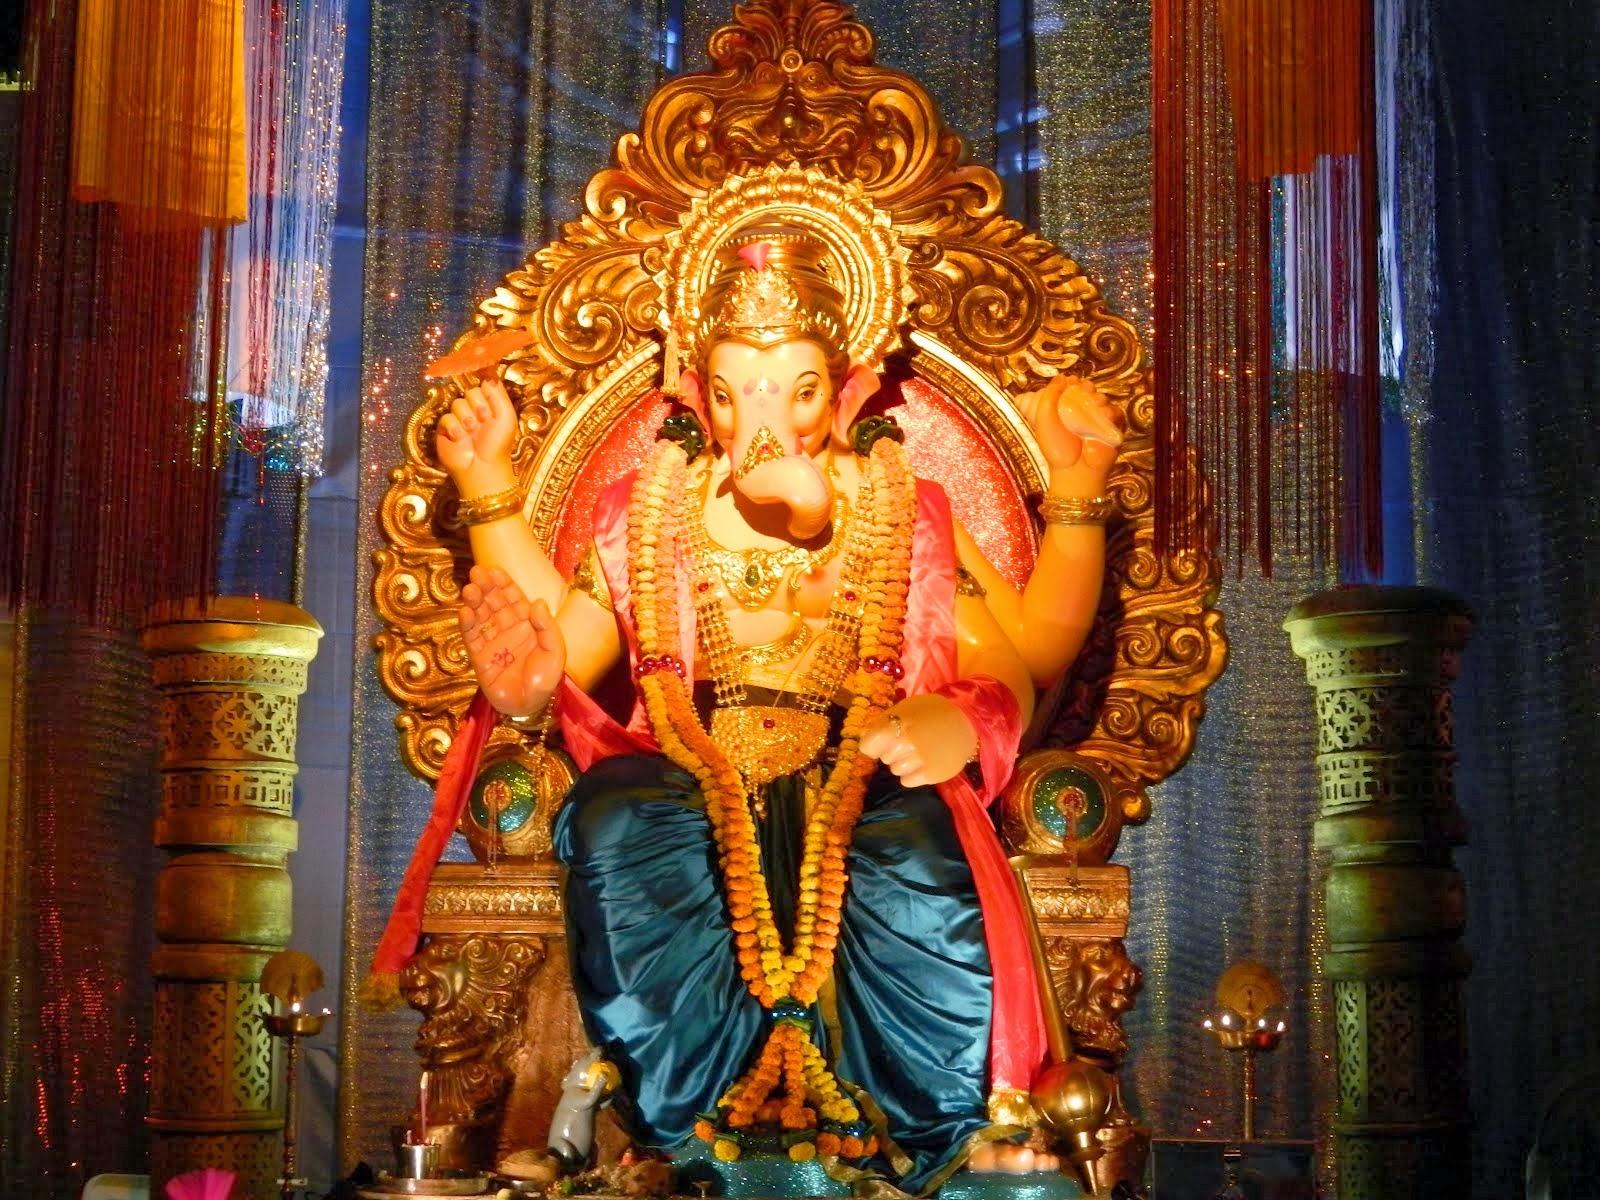 Ganpati Bappa Wallpaper Hd 3d Lalbaugcha Raja Hindu God Wallpapers Download